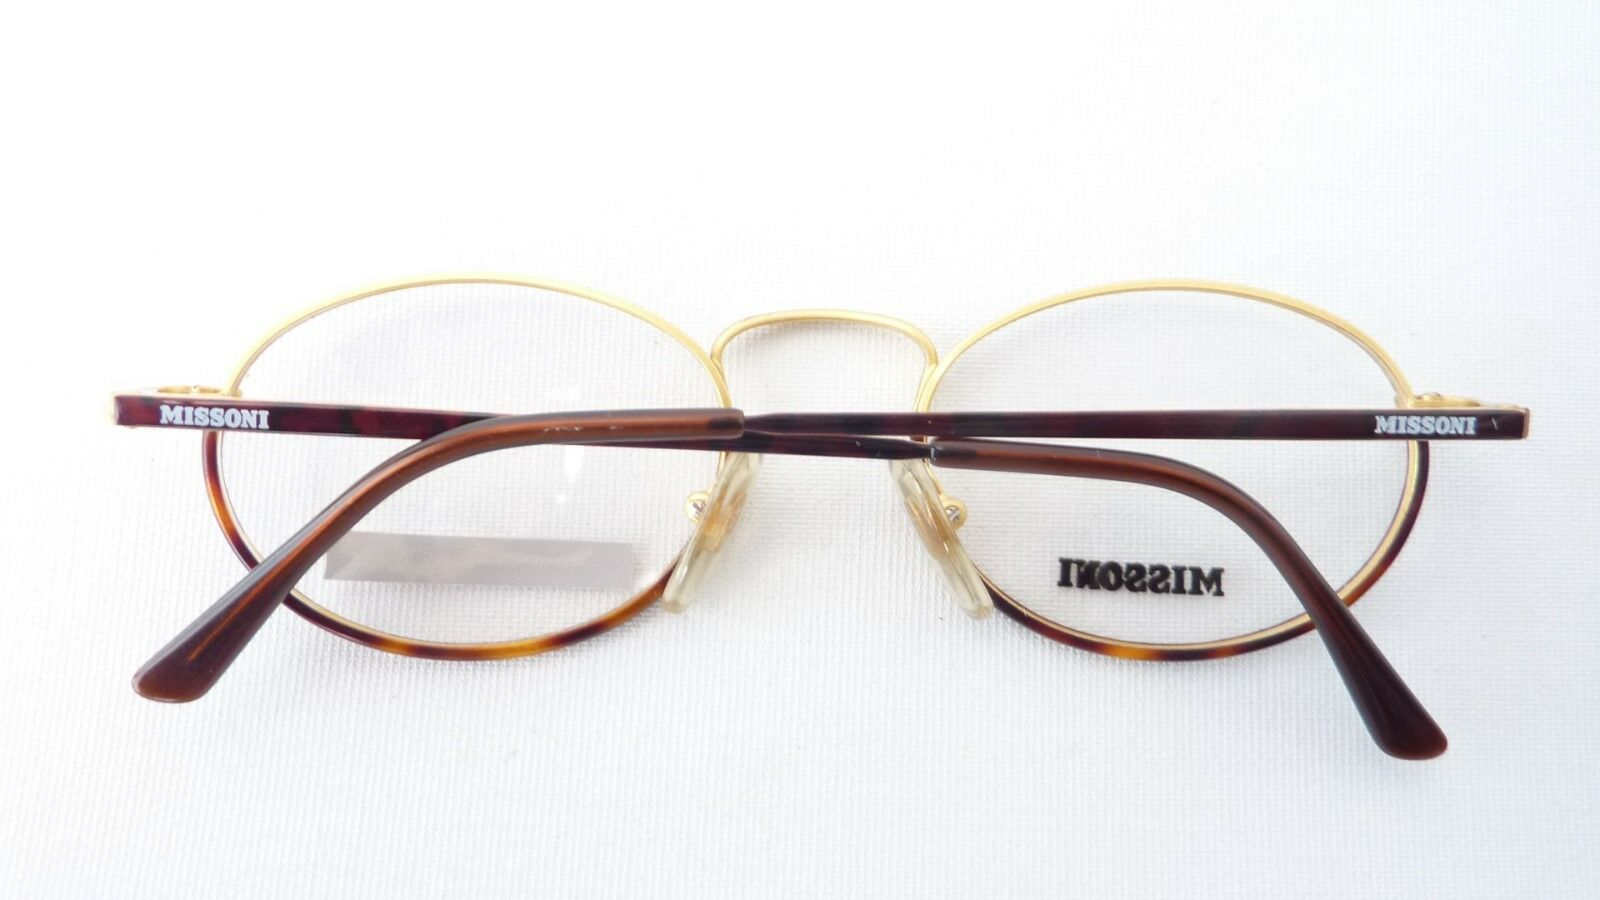 Designer Brille Missoni VintageFassung ovale Form Form Form Metallgestell ausgefallen Gr M  | Sale Outlet  786c80